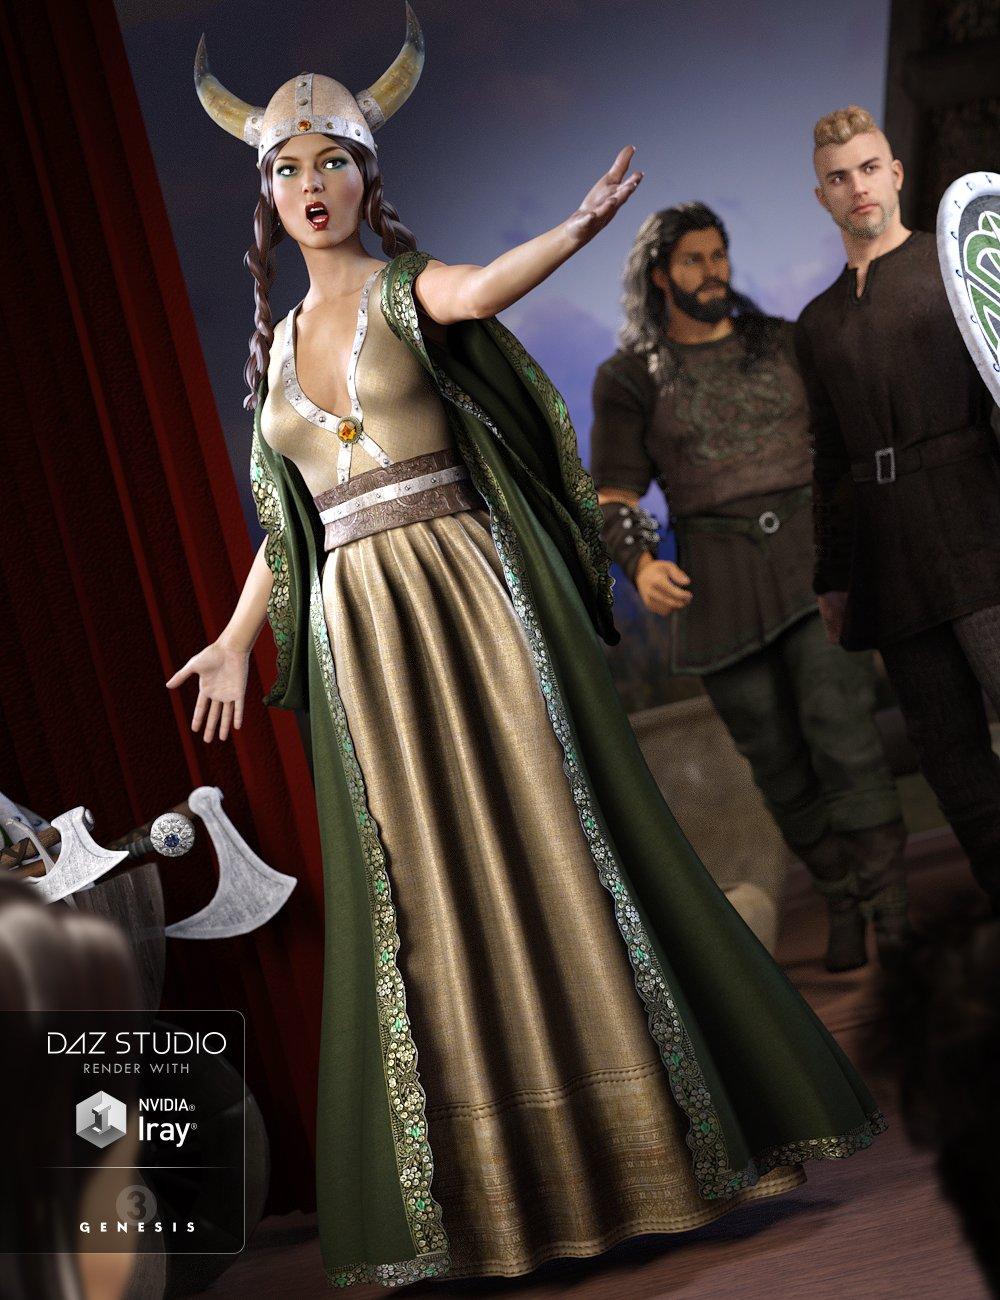 Viking Opera Singer for Genesis 3 Female(s) by: NikisatezShox-Design, 3D Models by Daz 3D